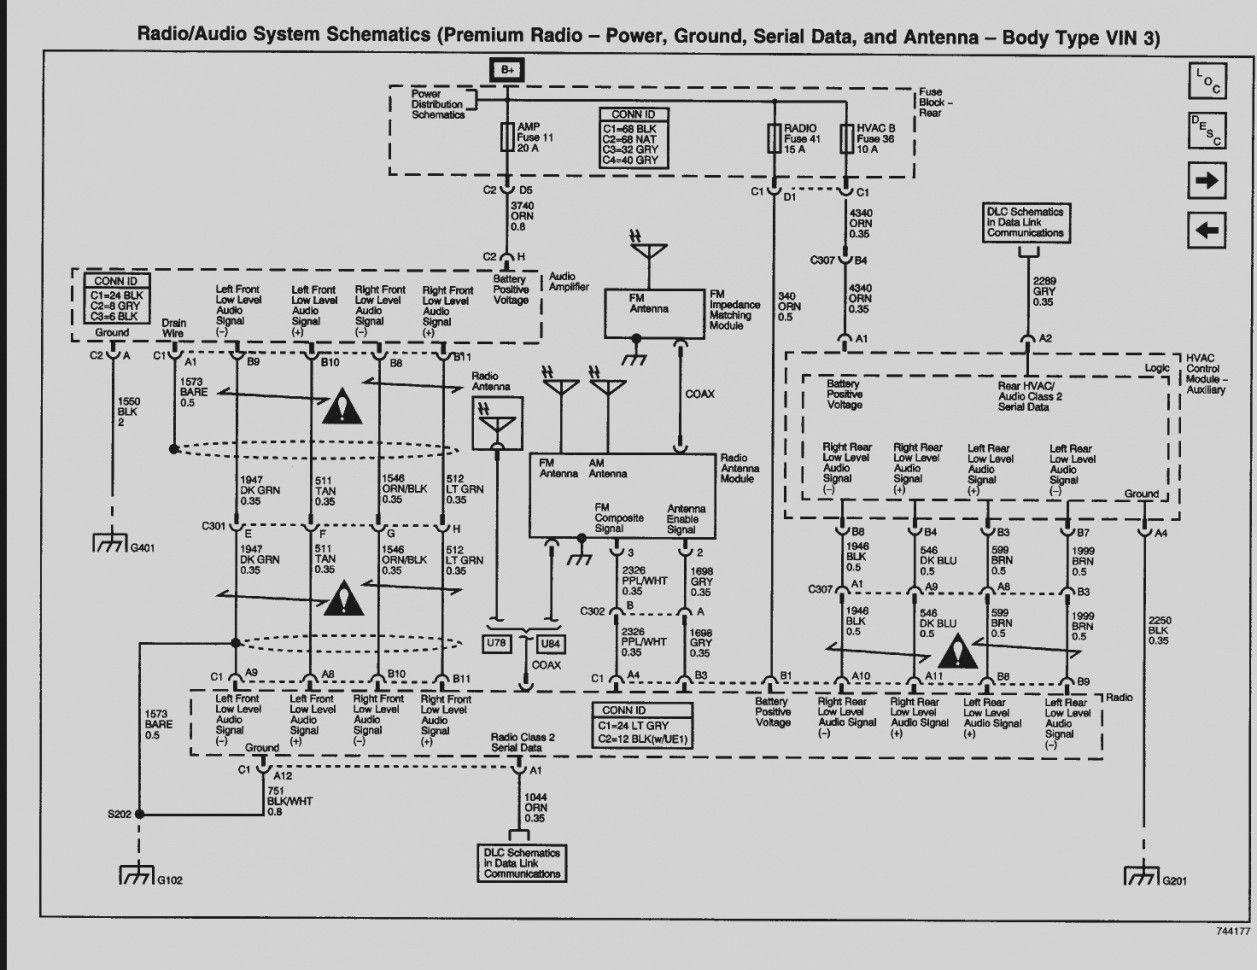 Collection Of 2009 Gmc Canyon Wiring Diagram 2003 Envoy Xl Free Download Diagrams On Free Wiring Diagrams Gmc Trucks Gmc Truck Accessories Gmc Envoy